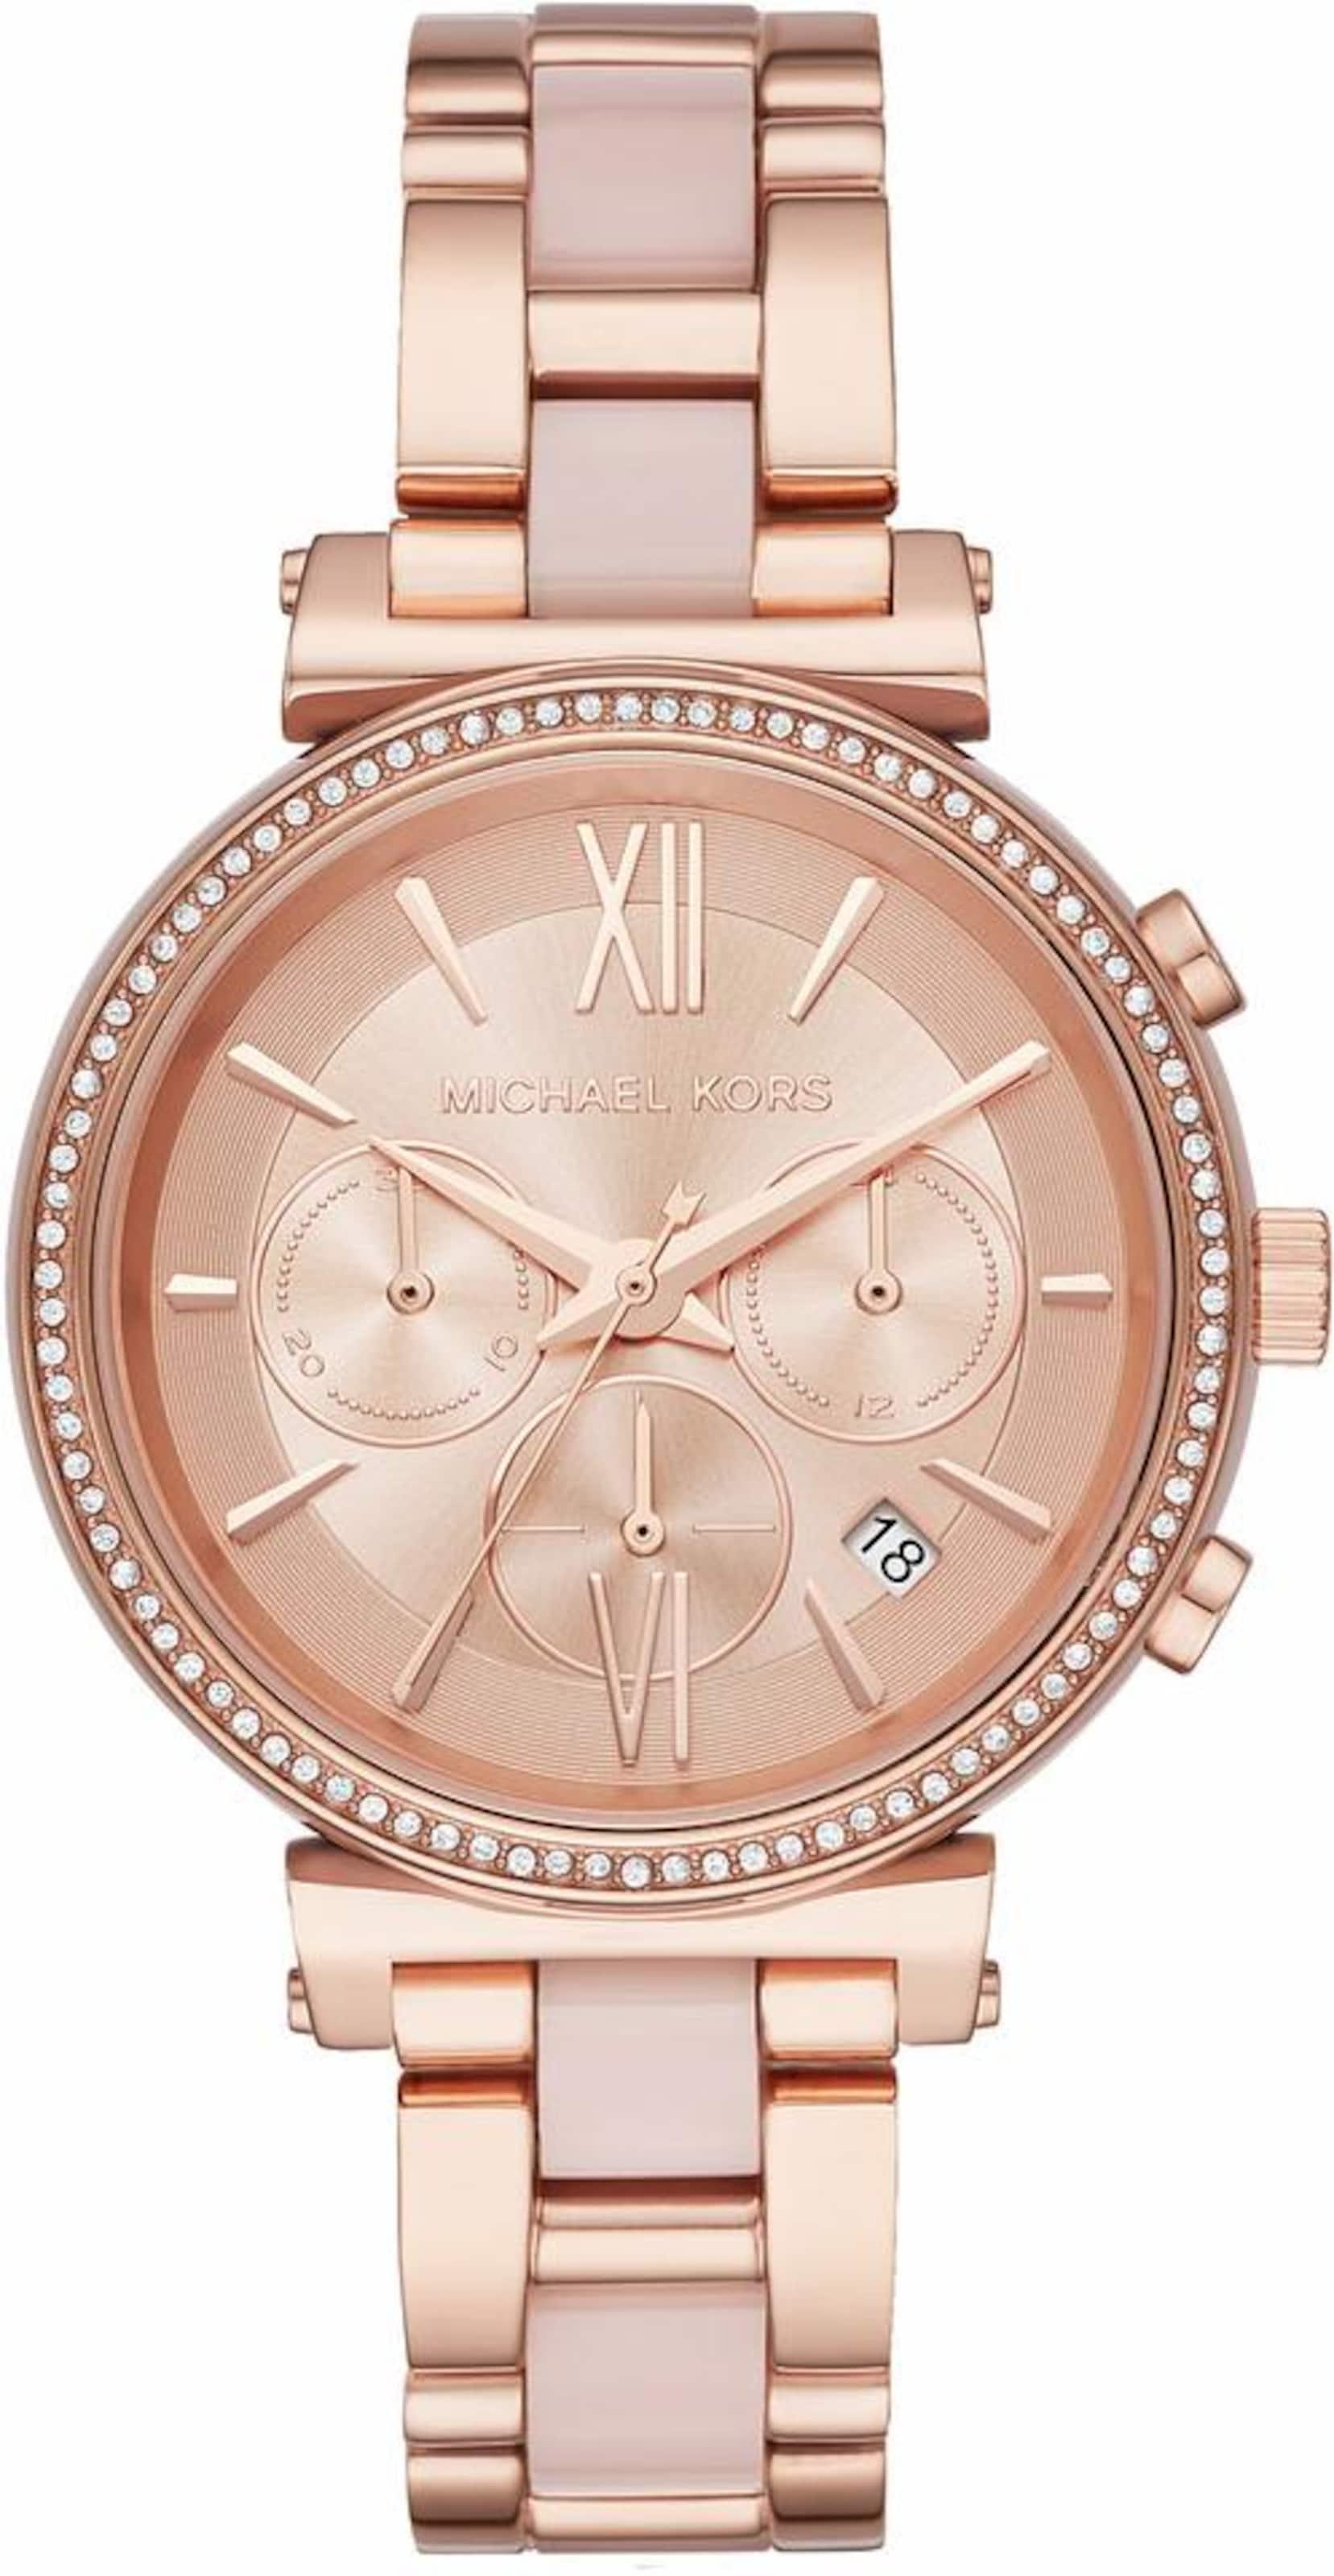 Michael Kors Chronograph 'SOFIE, MK6560'